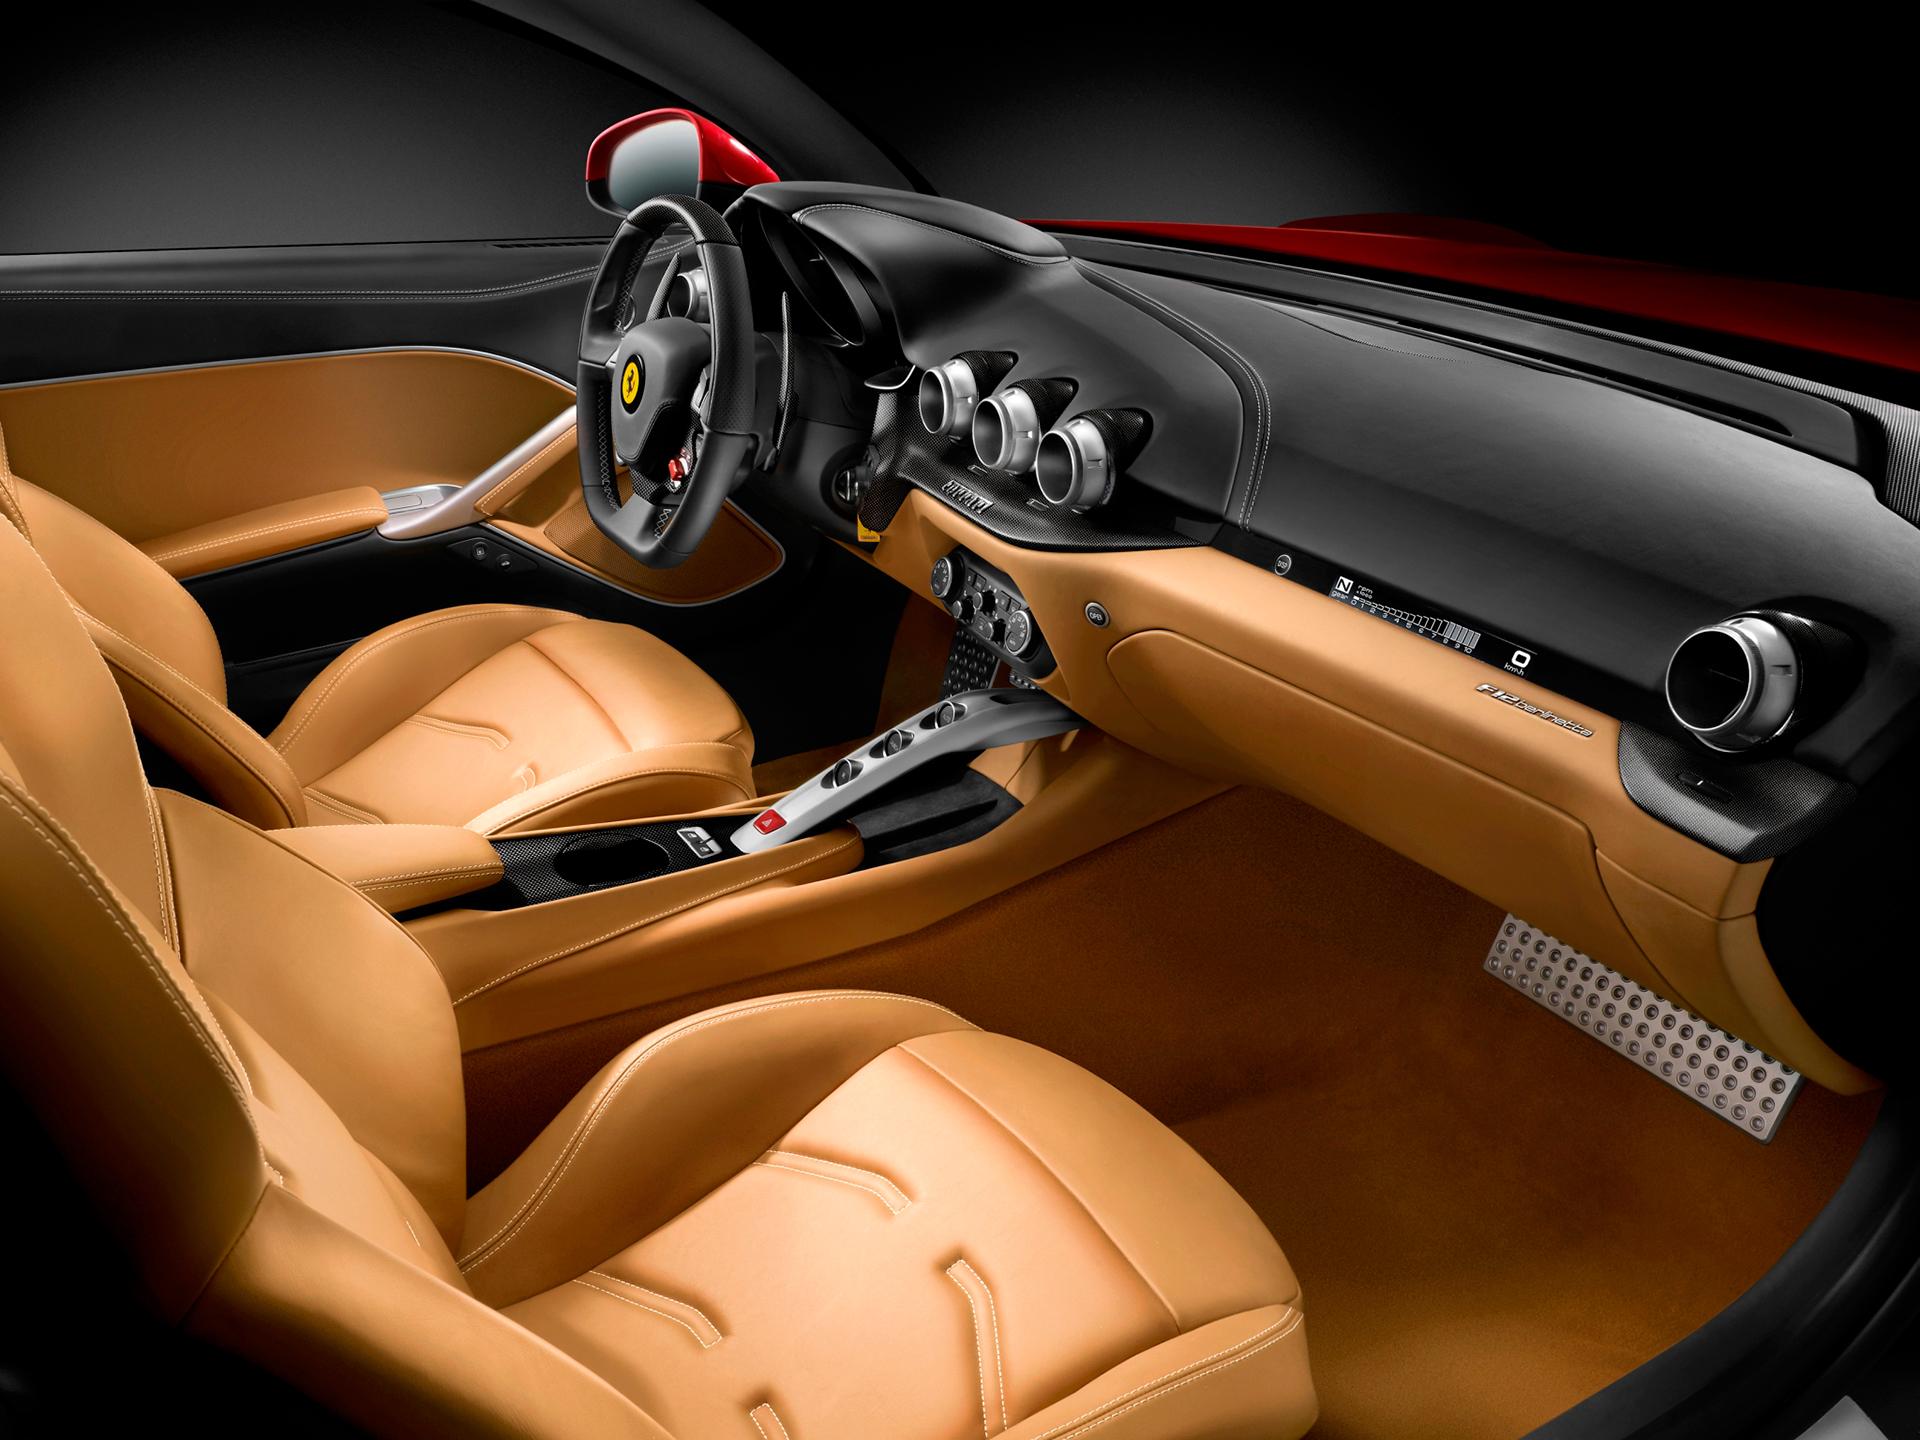 Ferrari F12berlinetta - intérieur / interior